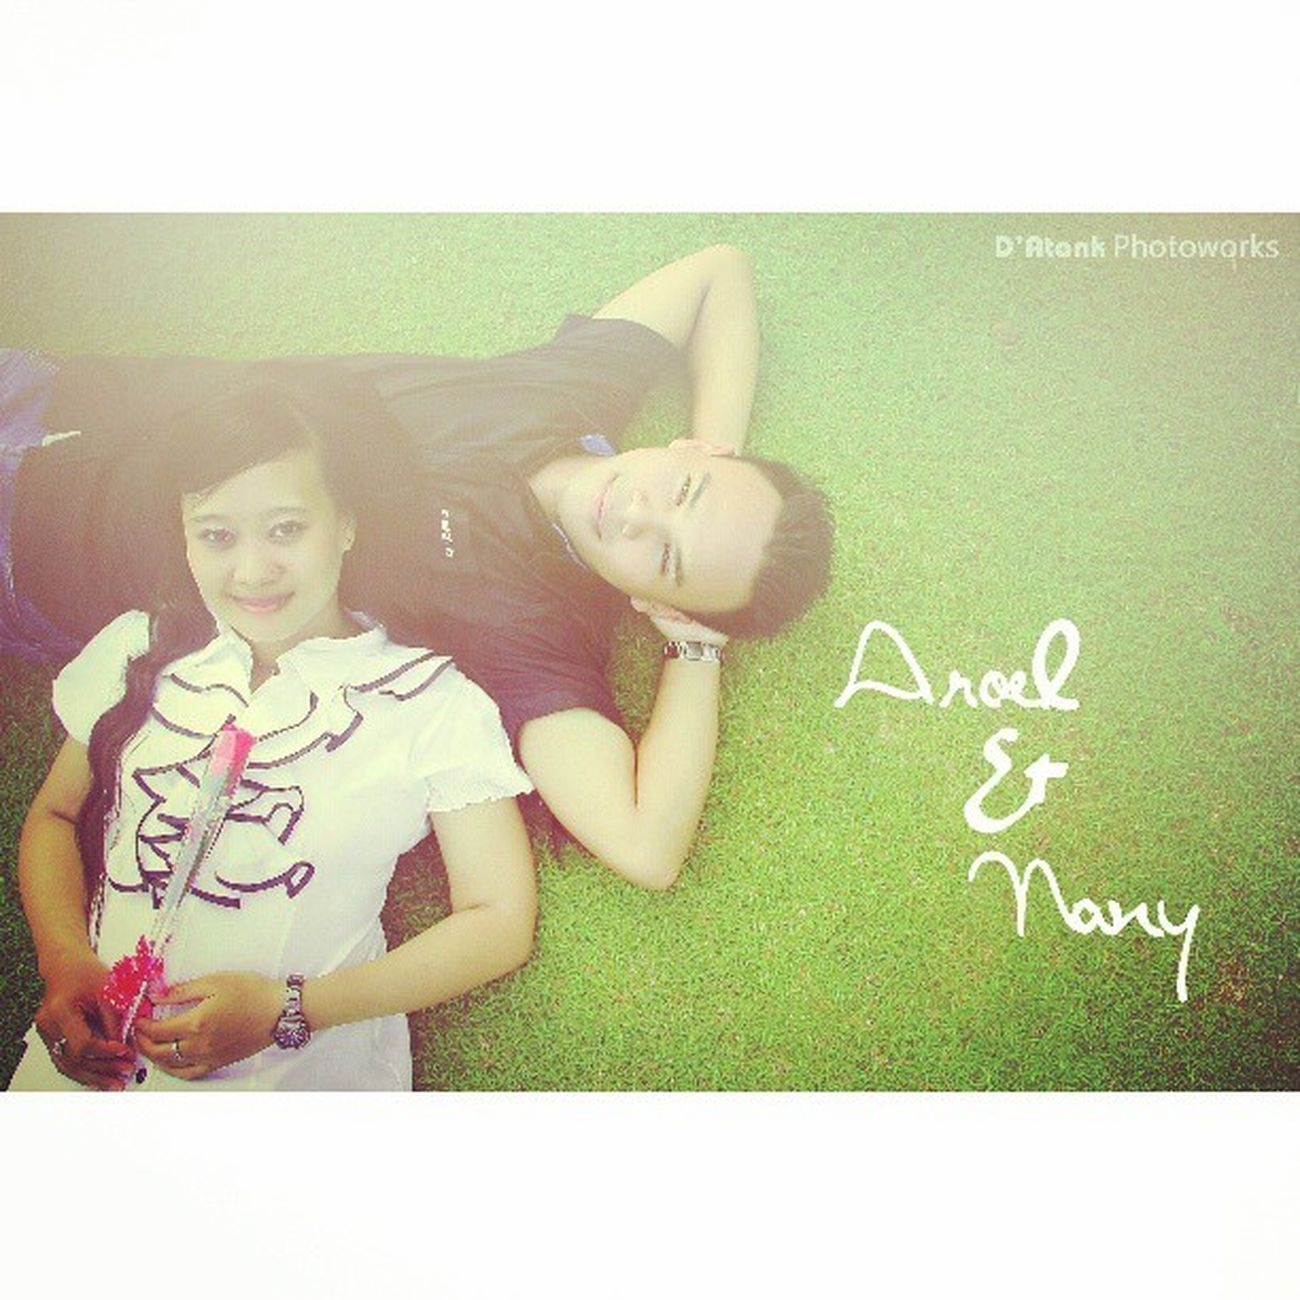 Aroel & Nany Couple Preweed Instatanjungtabalong Instabanjar Photoshoot